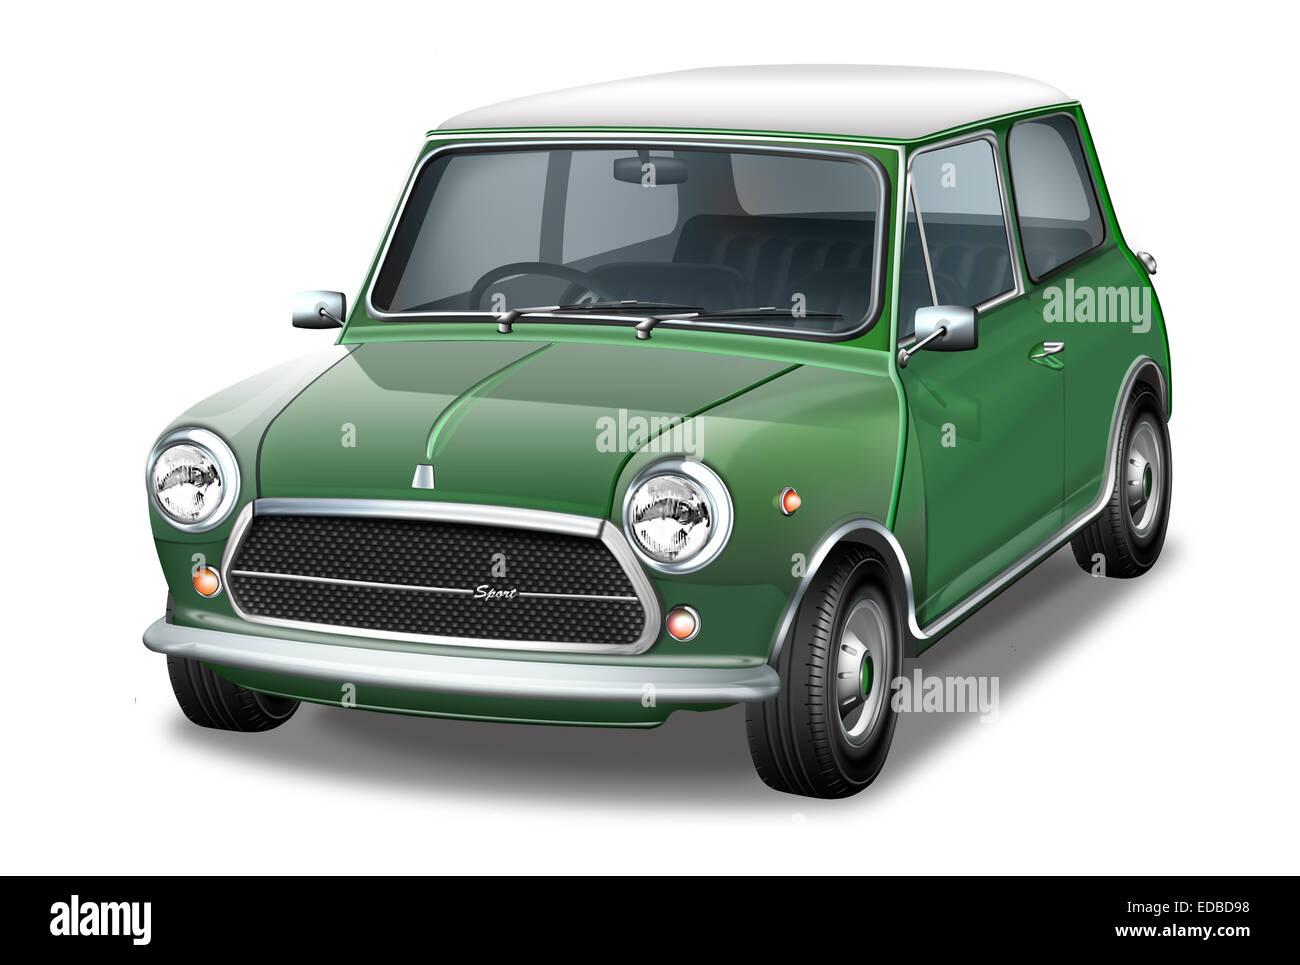 Mini Cooper, green English vintage car, illustration - Stock Image